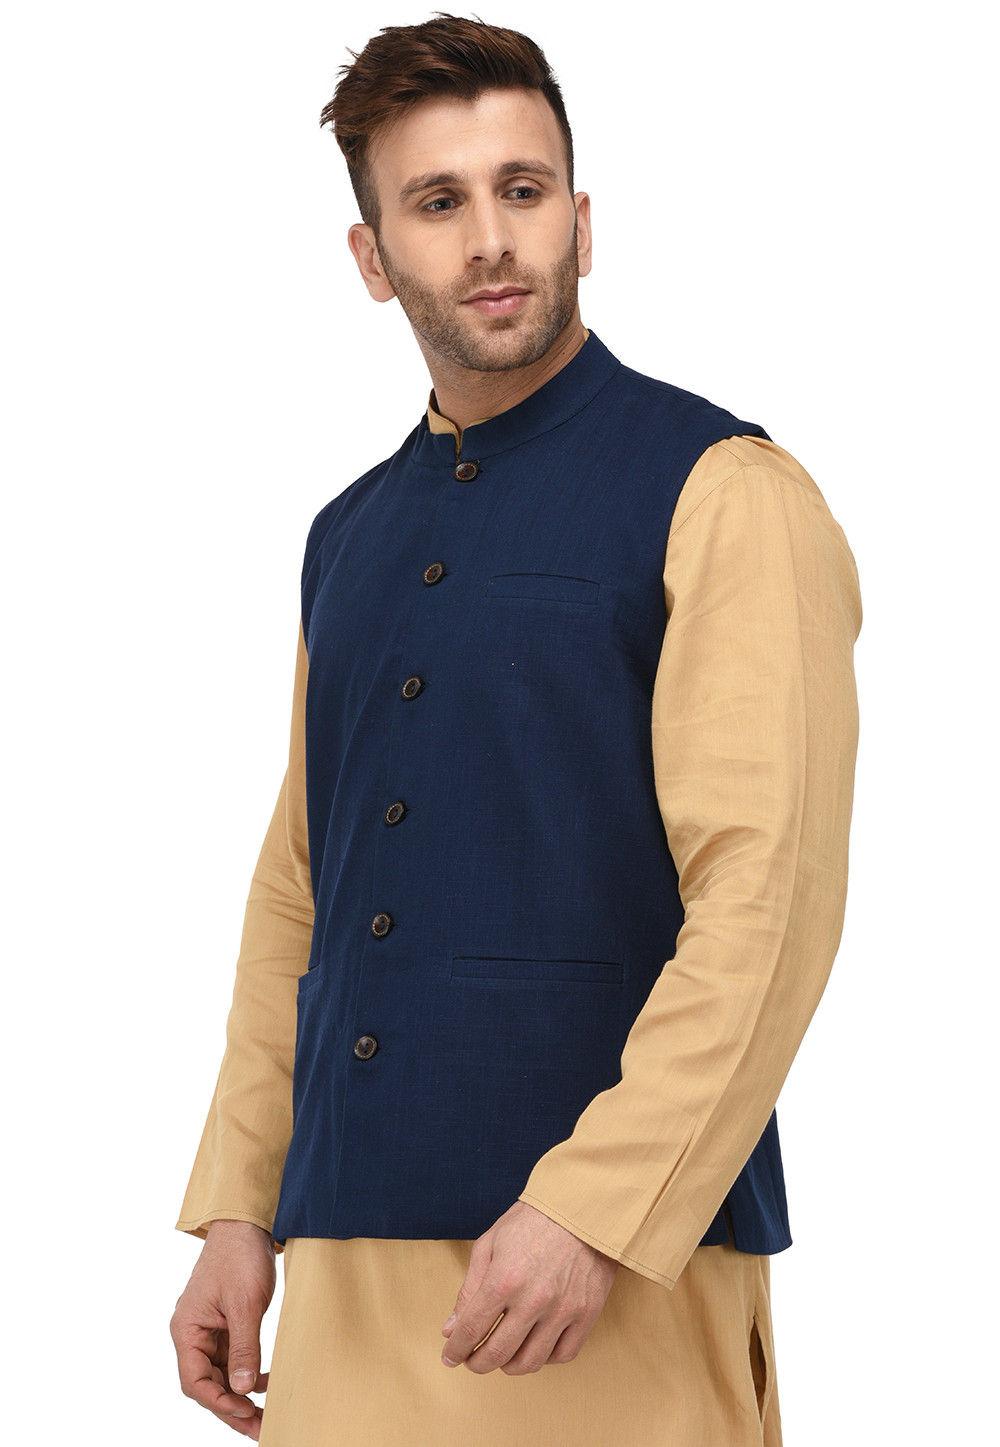 Plain Cotton Slub Nehru Jacket in Navy Blue : MGZ3